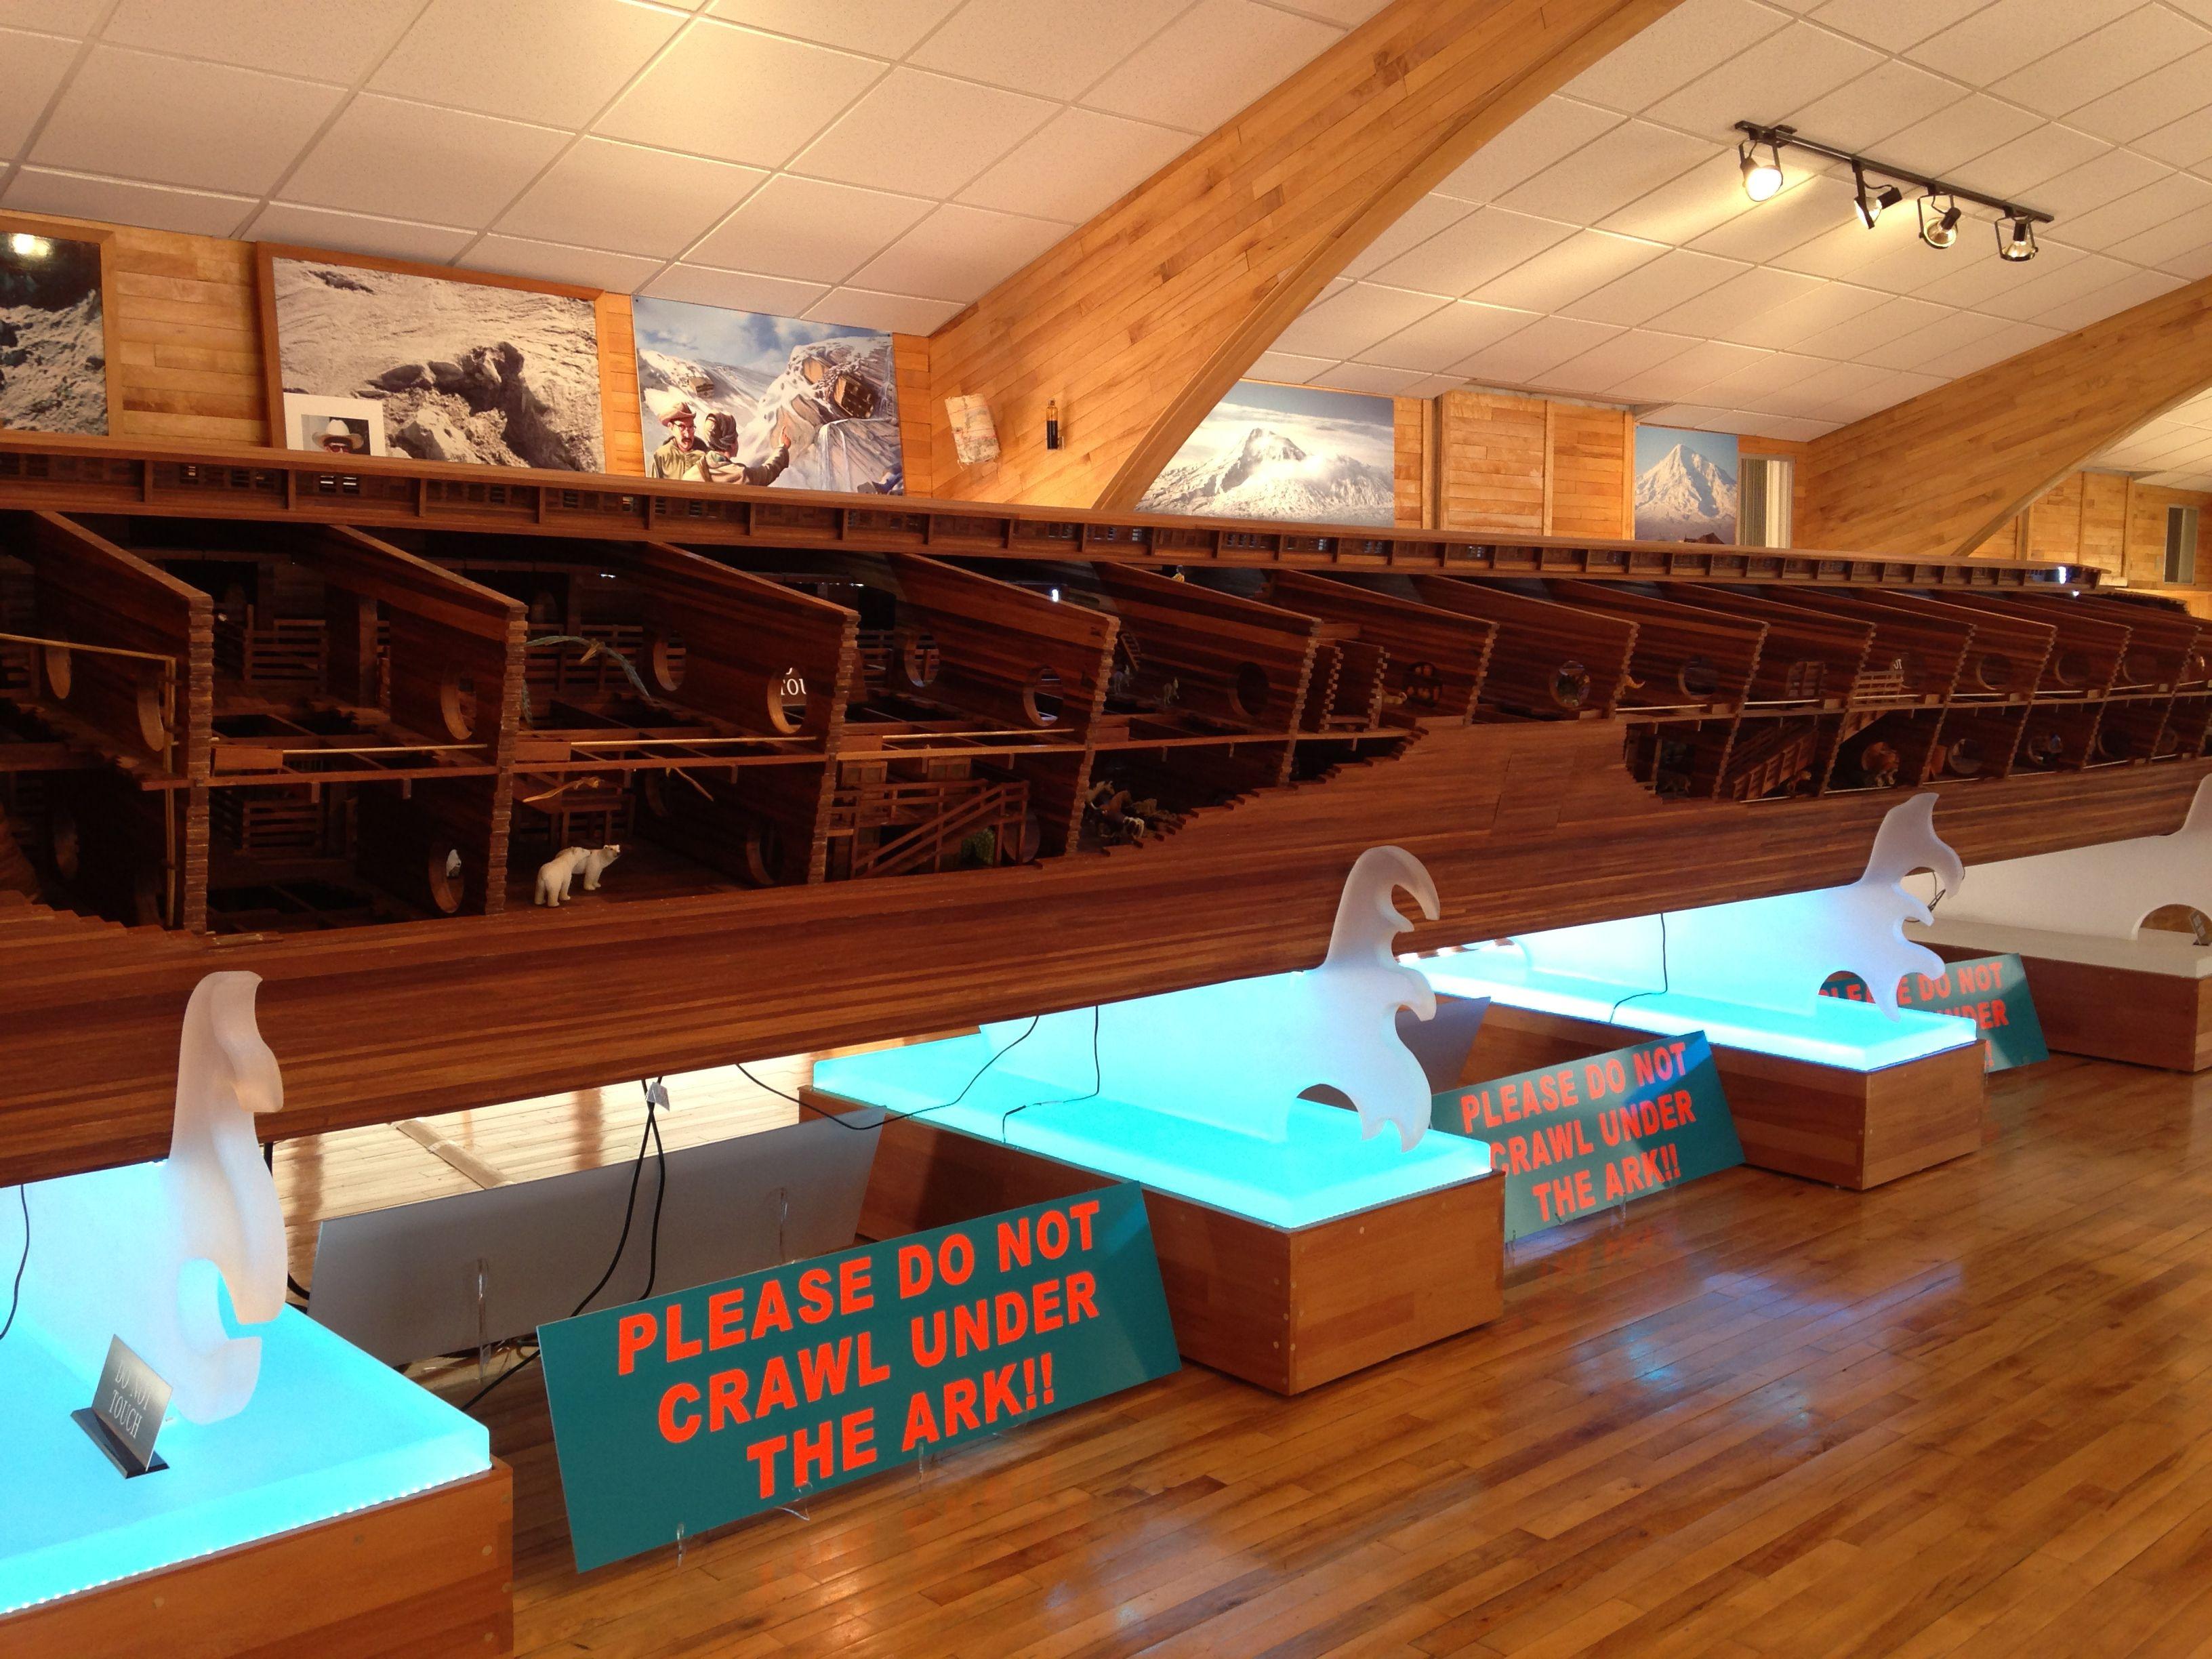 Noah S Ark Replica At The Creation Museum In Glen Rose Texas